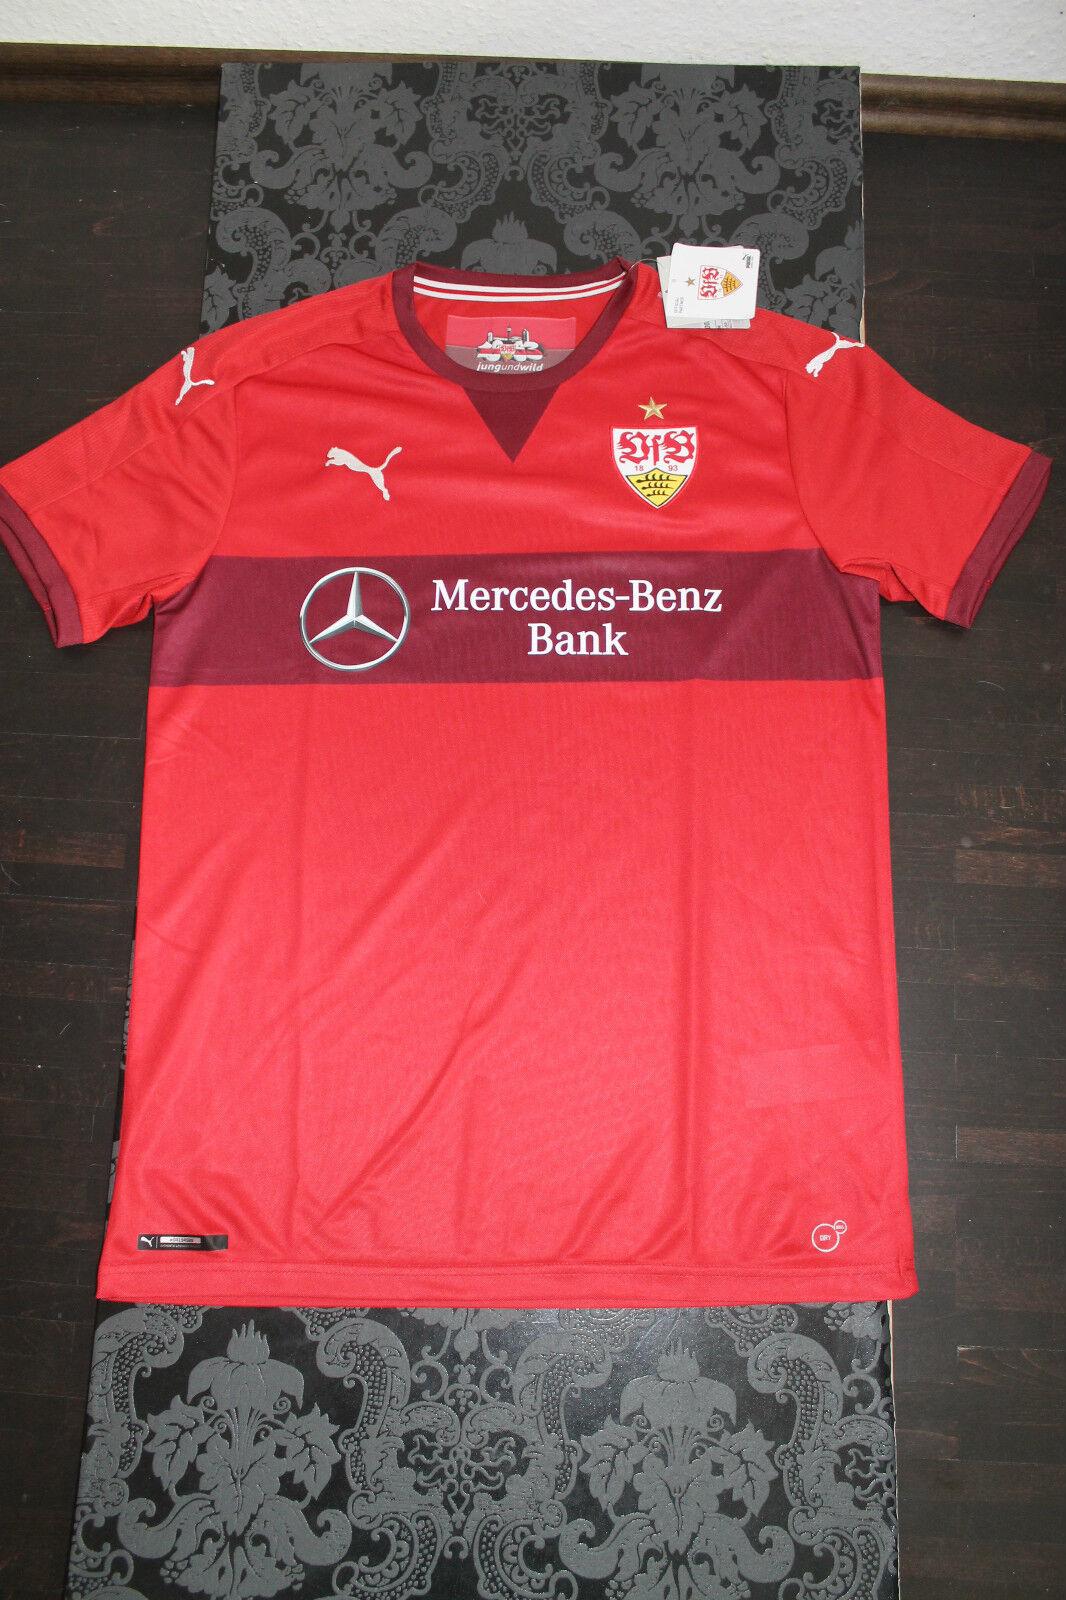 Puma VfB Stuttgart Auswärts Away Trikot 2015 2016 Rot alle Größen Neu